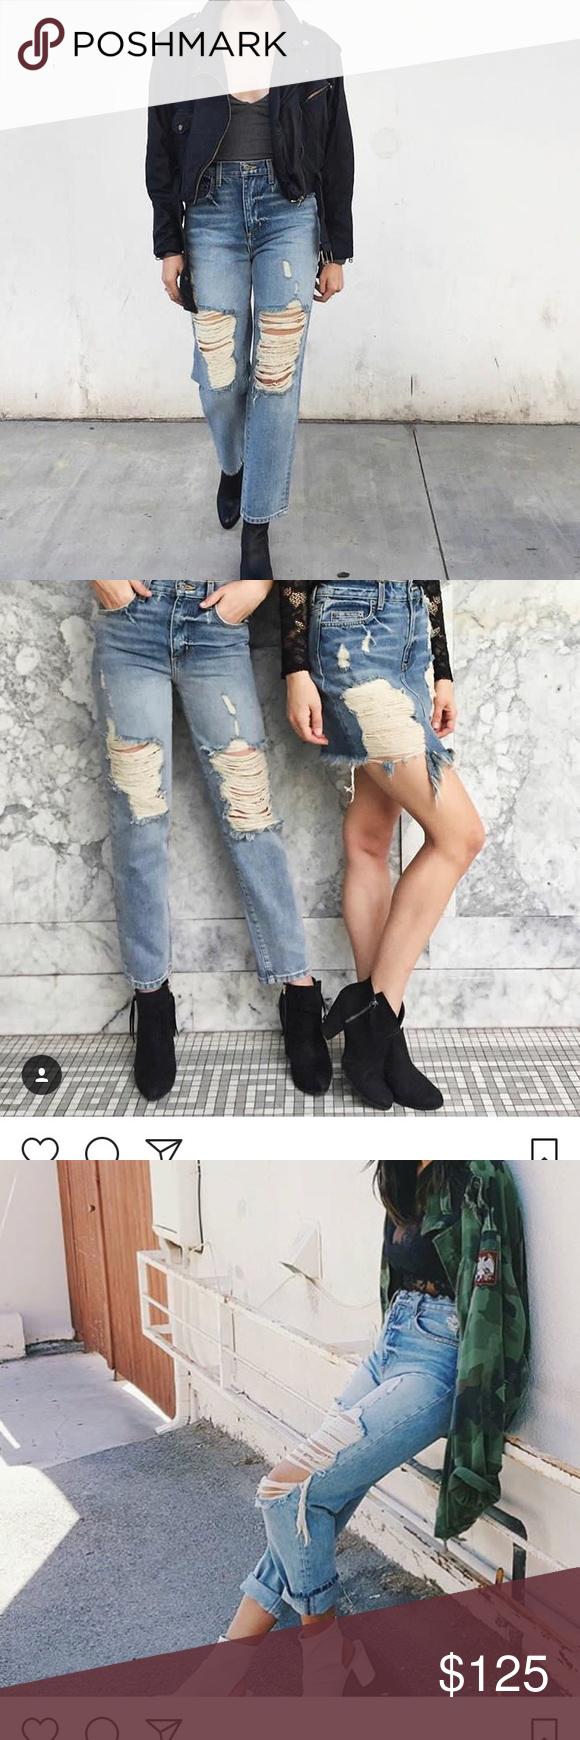 ⭐️ LF ⭐️ CARMAR Distressed Boyfriend Jeans NWOT never worn, tags taken off. Brand new!! LF Jeans Ankle & Cropped